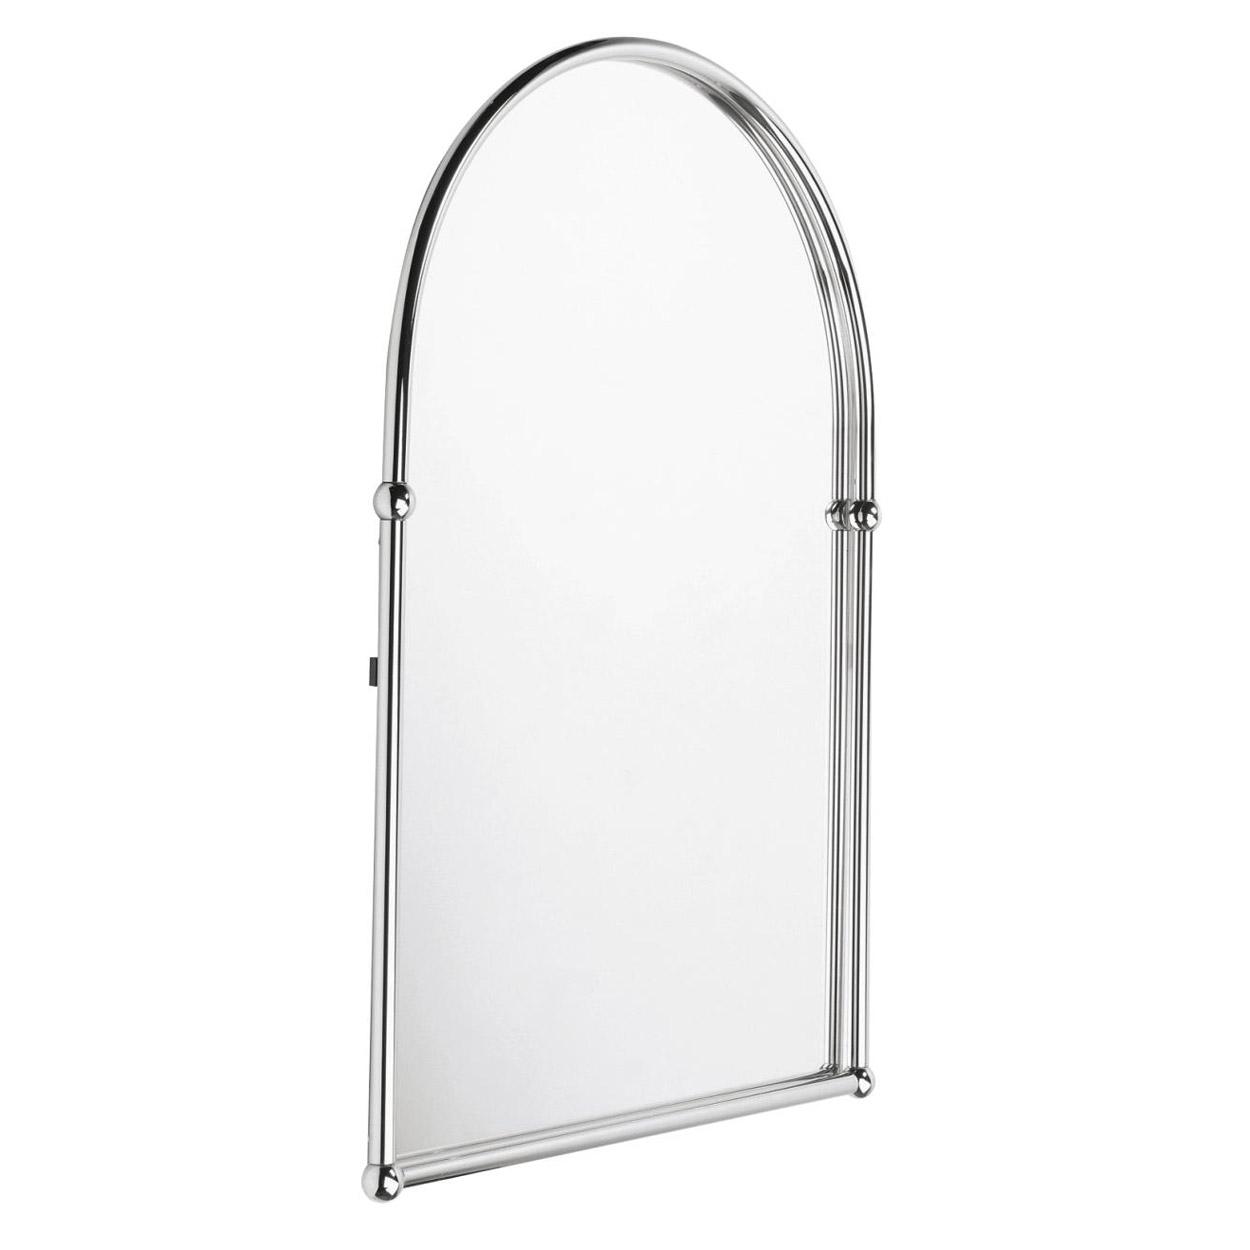 Bristan Solo Bathroom Mirror Chrome Plated